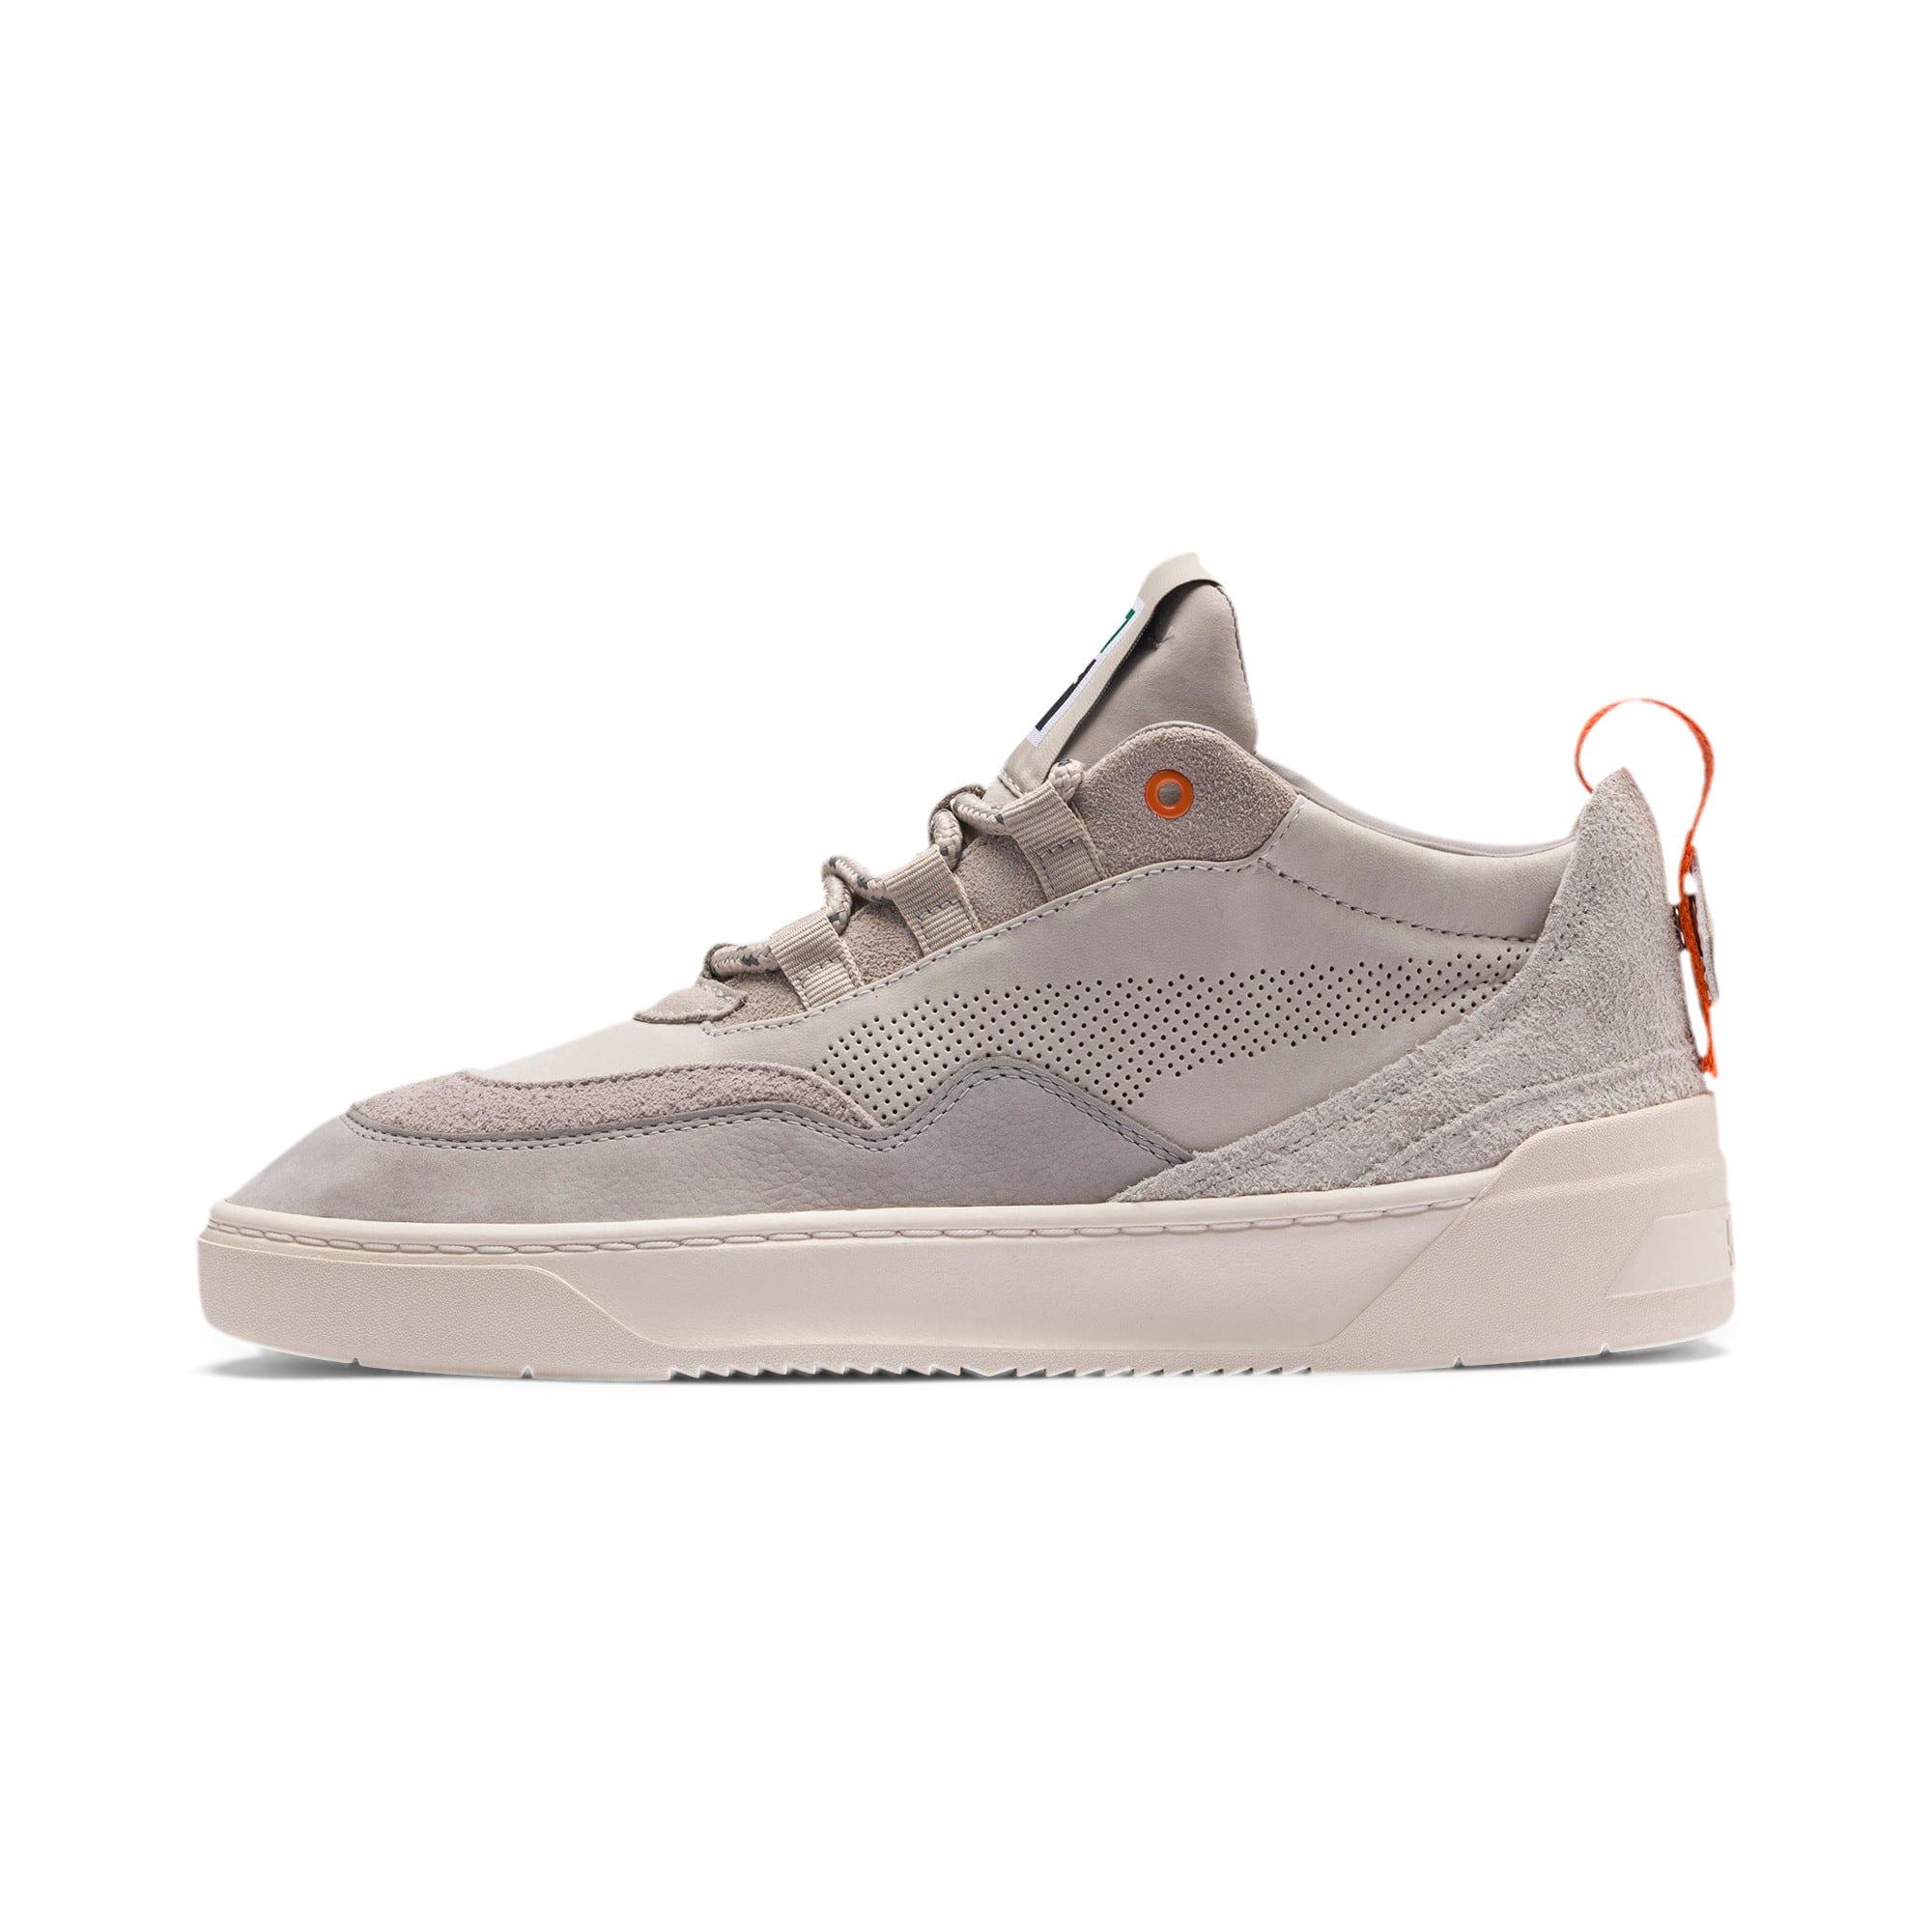 Imagen en miniatura 1 de Zapatillas Cali Zero Demi Beige, Satellite-Silver Gray, mediana